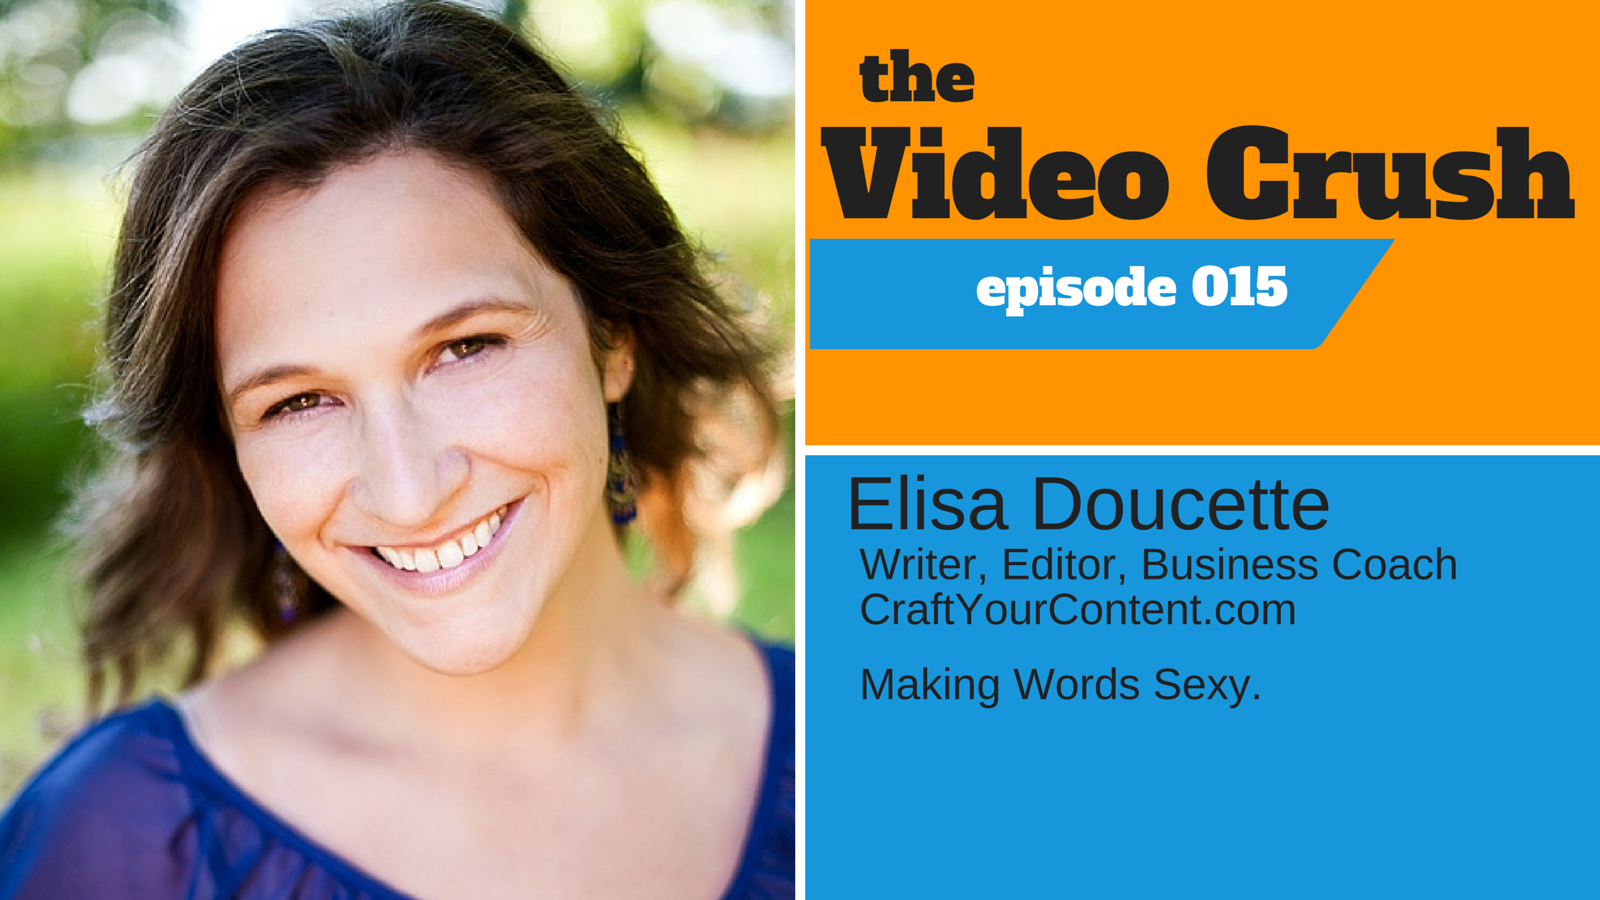 Elisa Doucette - Craft Your Content